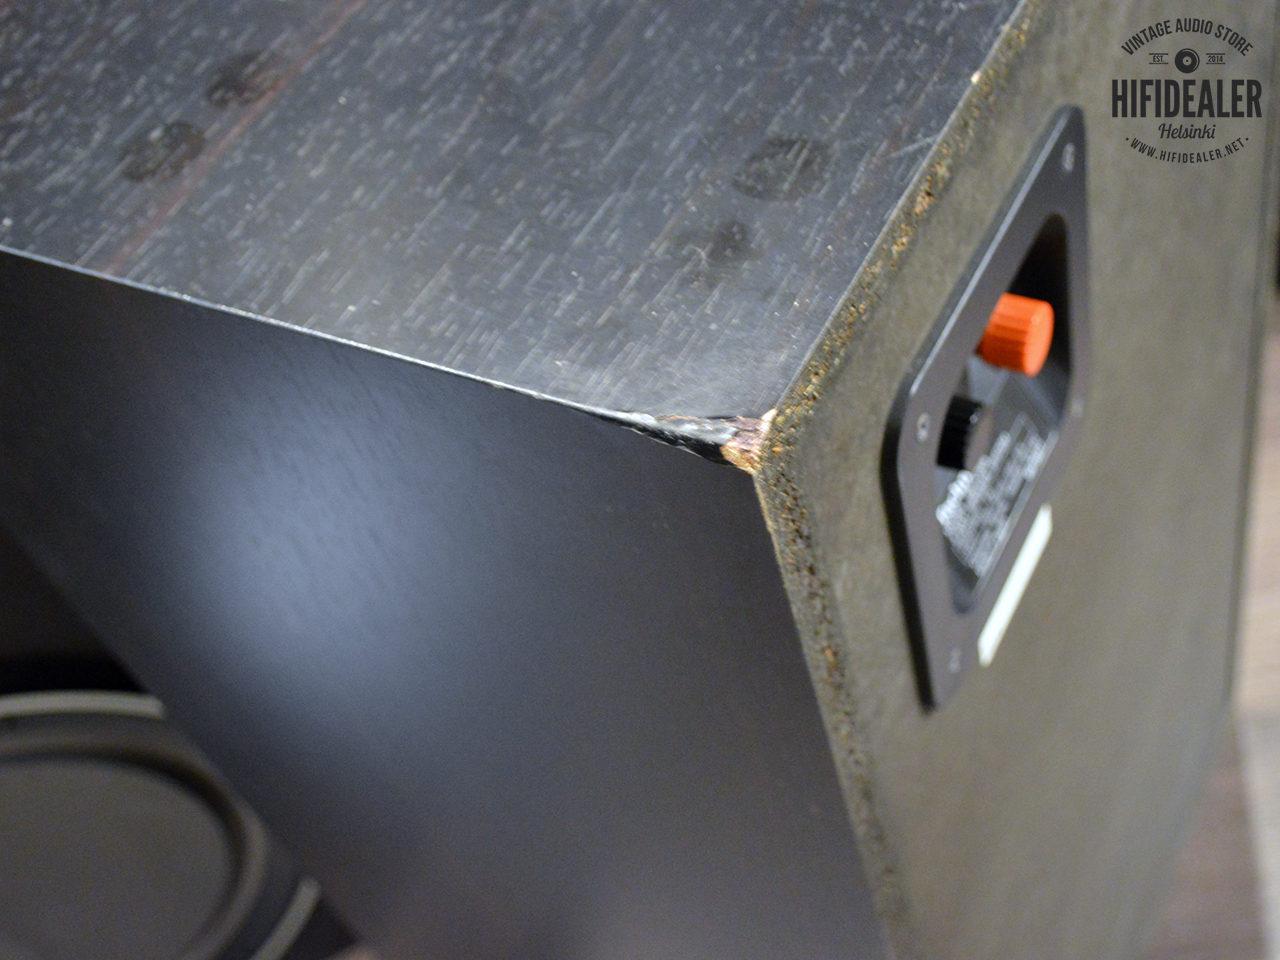 technics-sb-x700a-3